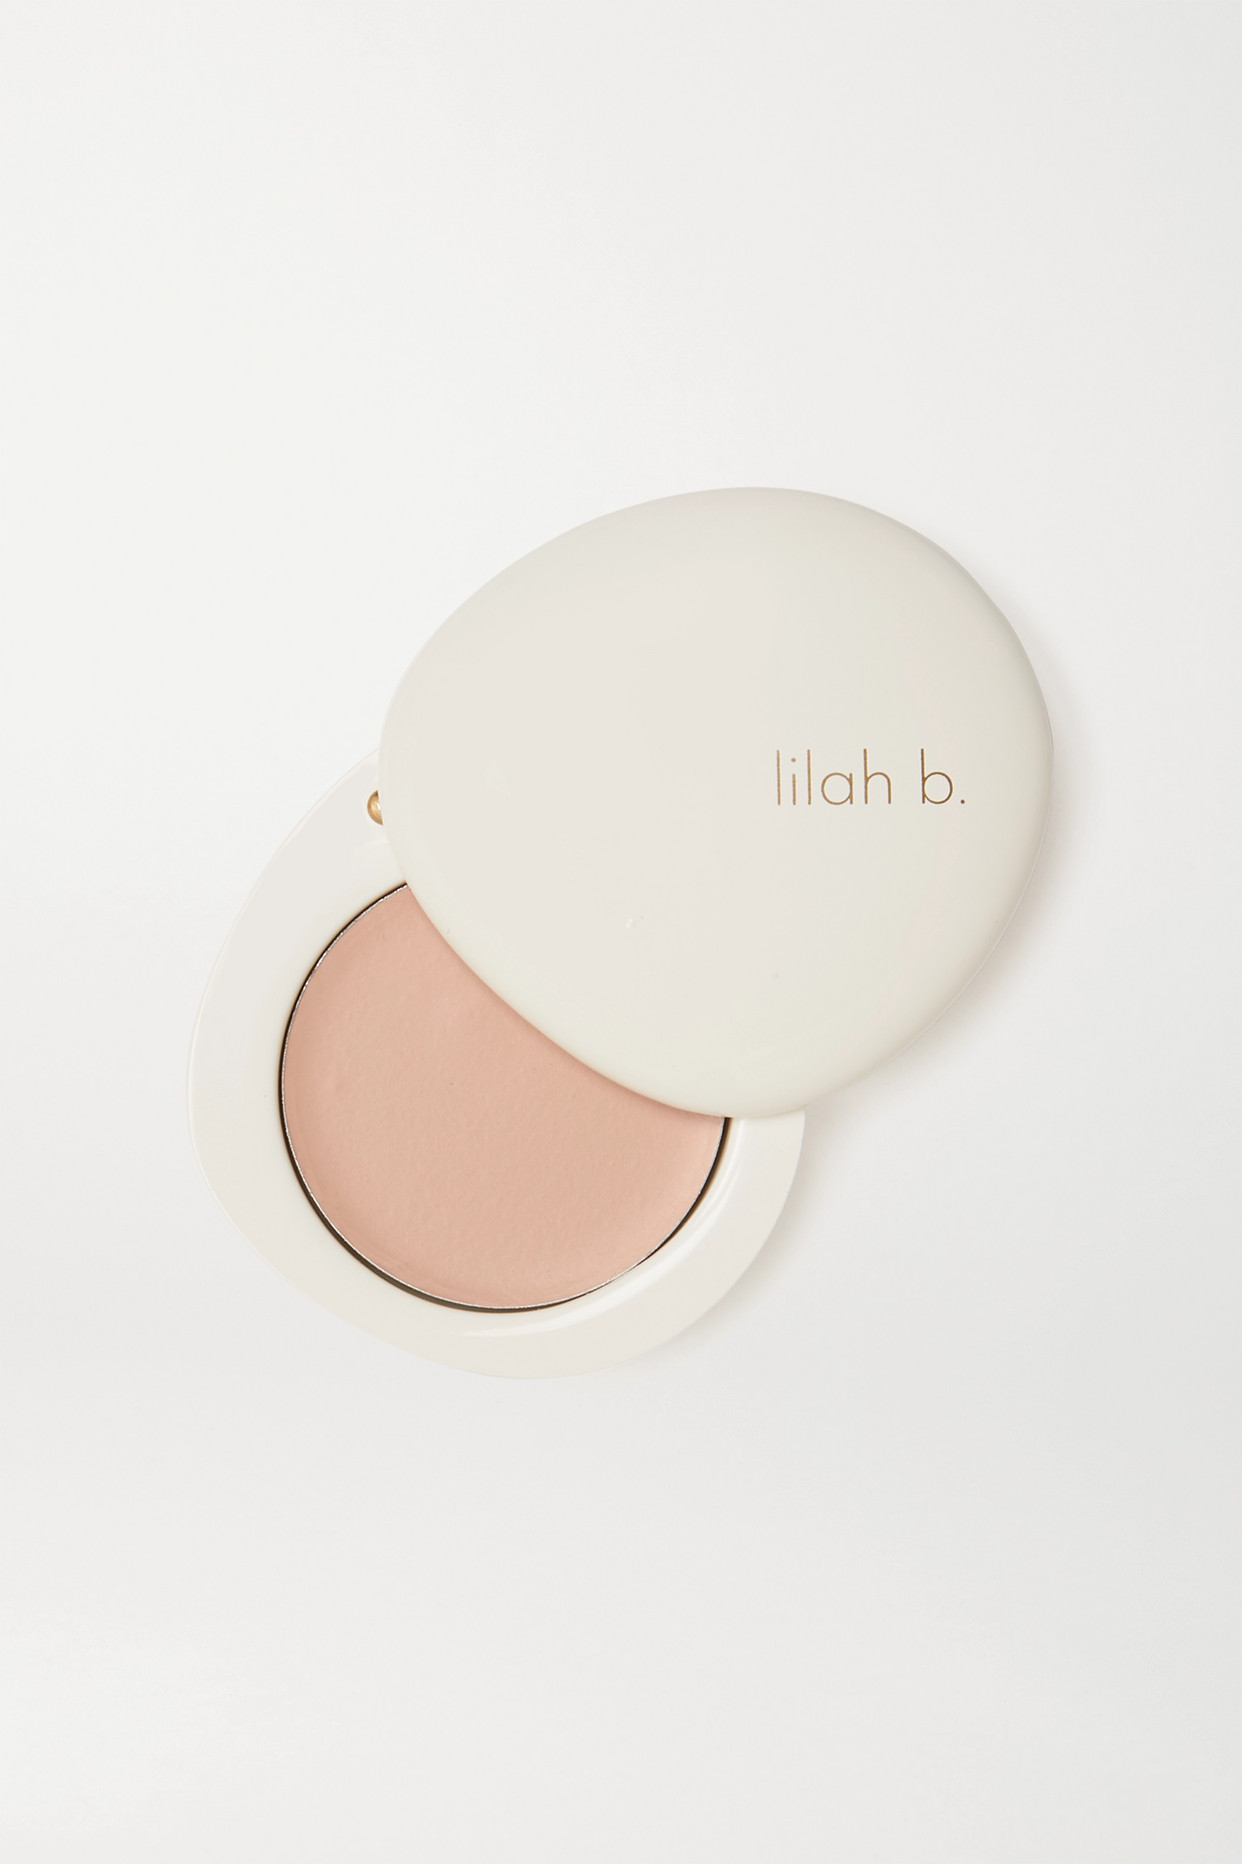 LILAH B. - Virtuous Veil Concealer & Eye Primer - B. Vibrant - Neutrals - one size